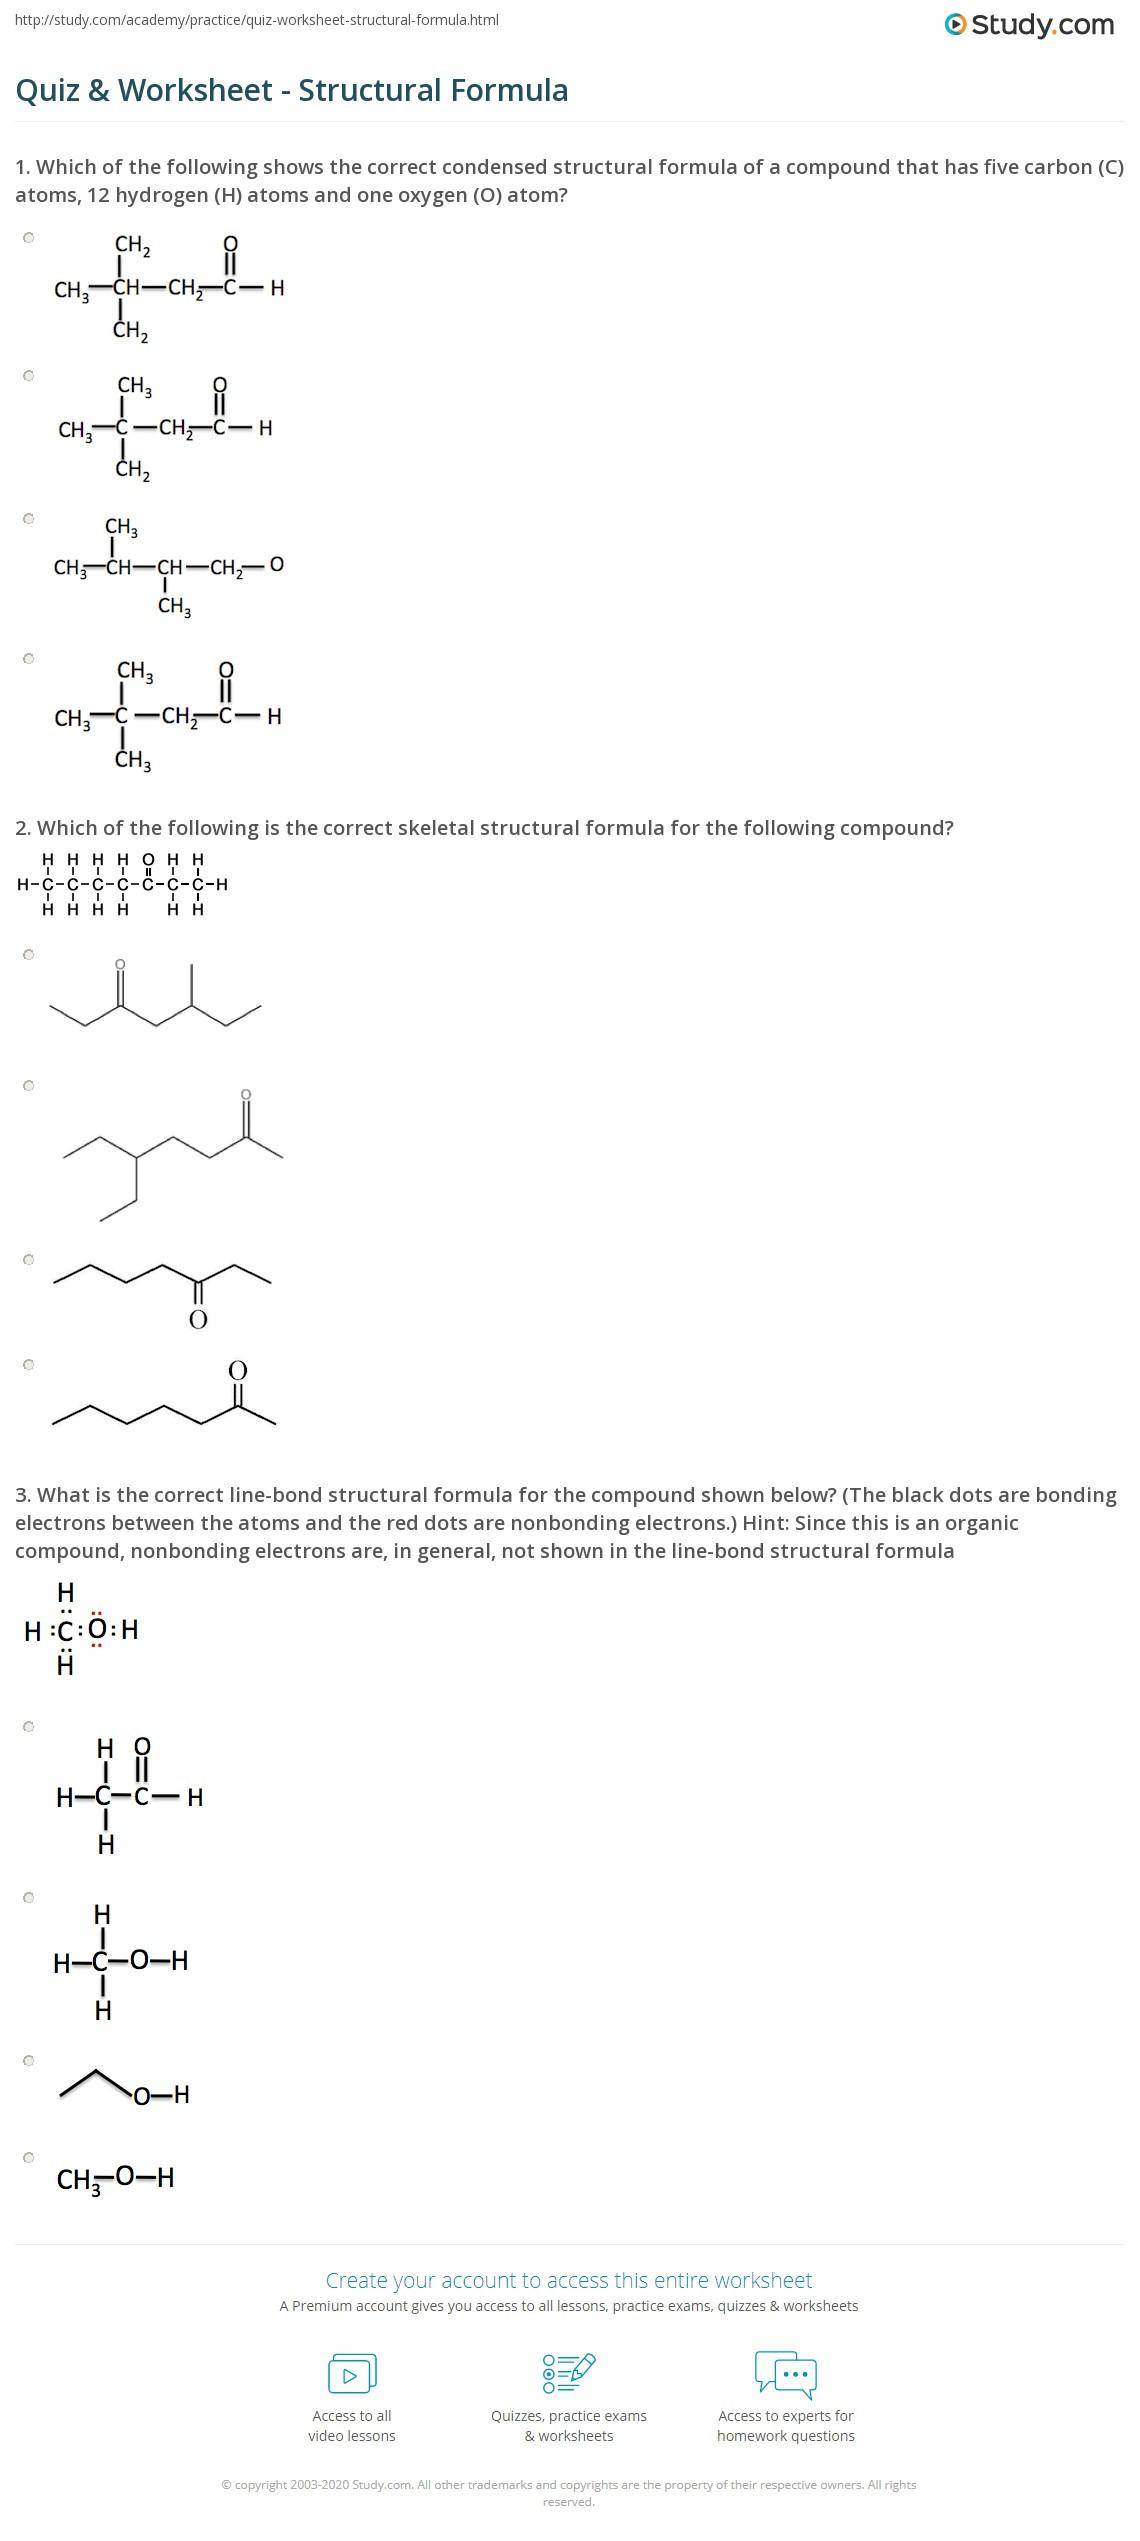 30 Worksheet For Basic Stoichiometry Answer